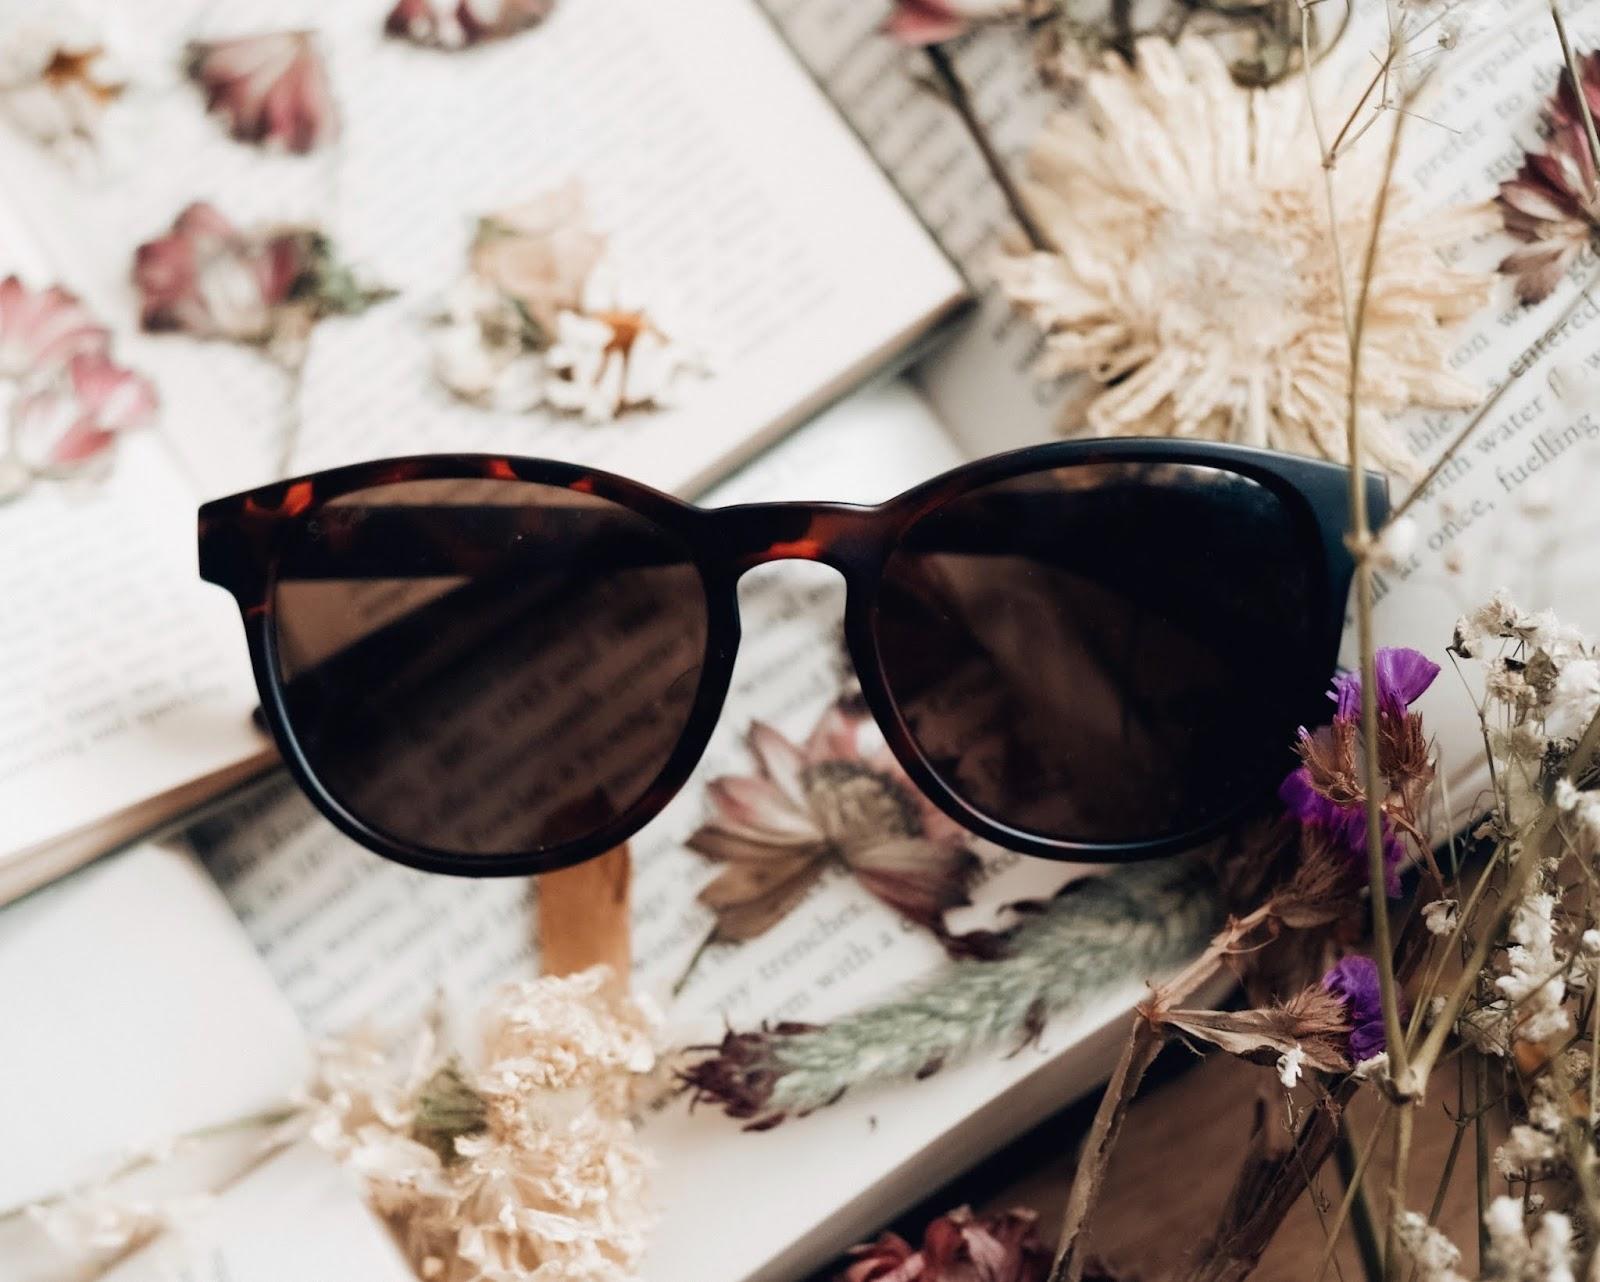 sustainable sunglasses, lifetime guarantee sunglasses, plastic free sunglasses, cheap eco friendly sunglasses,womens sunglasses, eco friendly sunglasses uk, recycled sunglasses, sunglasses uk, sunglasses shop, designer sunglasses, green sunglasses, ethical sunglasses, slow fashion, sunglasses made from recycled plastic, durable sunglasses, conscious sunglasses, eco friendly sunglasses, eco-friendly sunglasses